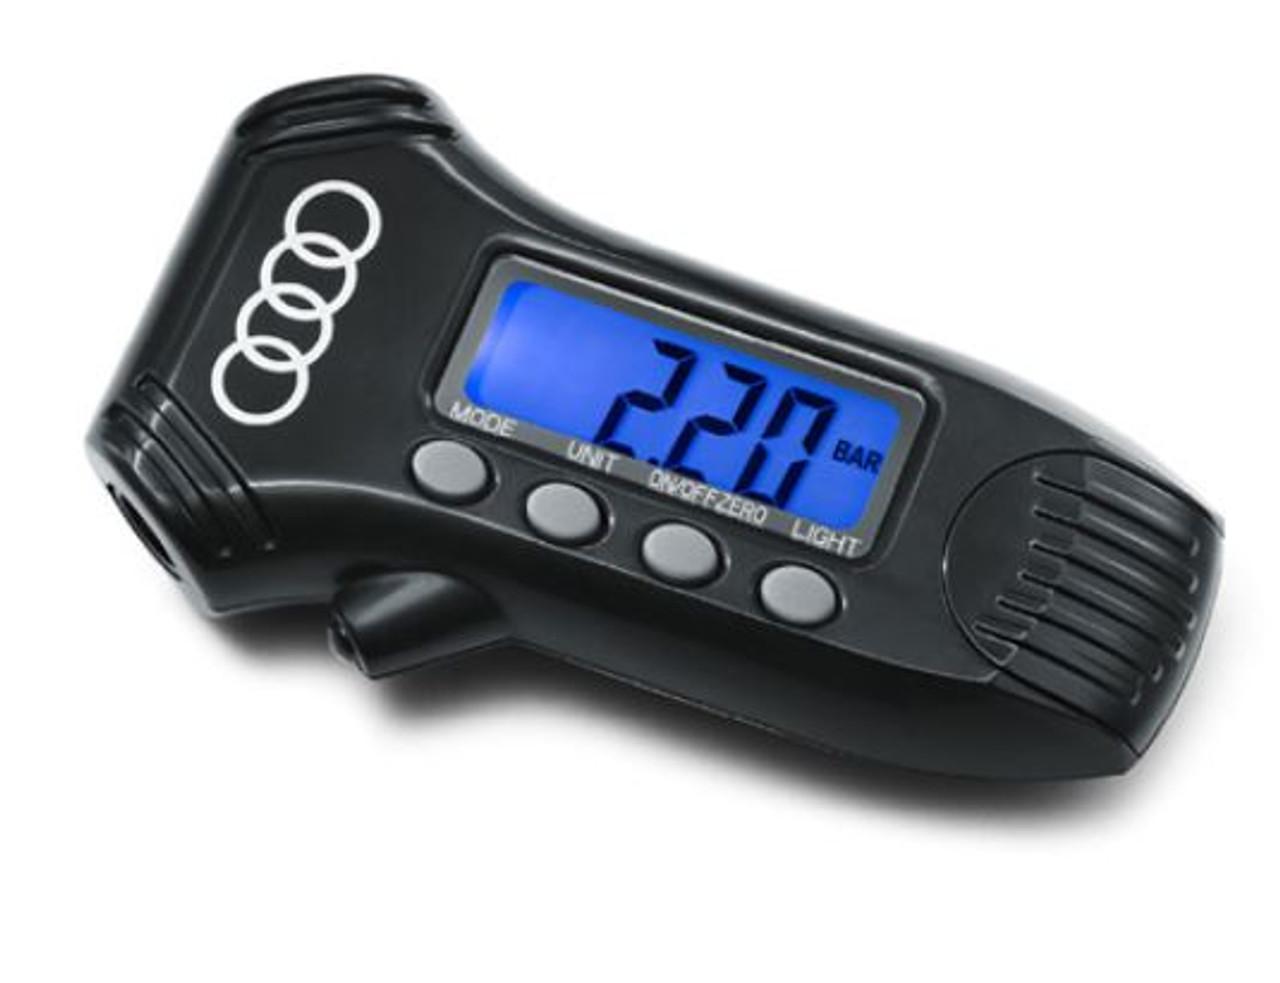 AUDI Tyre Pressure and Tread Depth Gauge